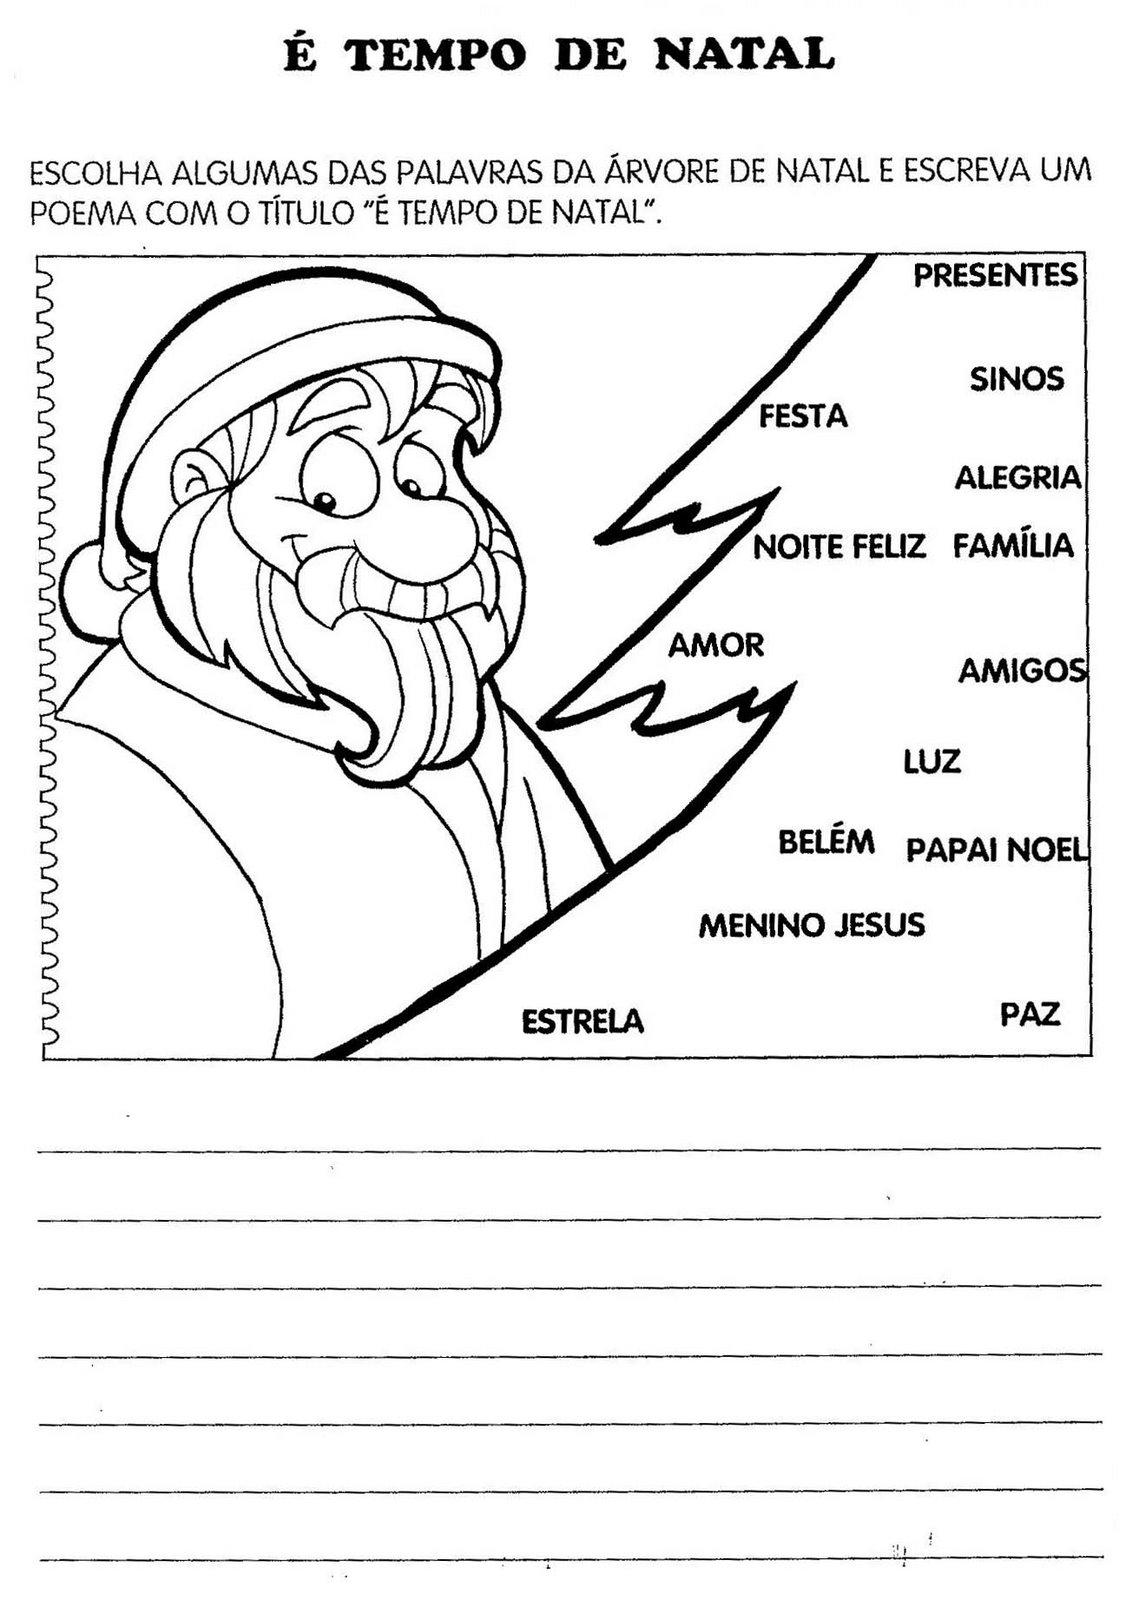 Atividades De Natal Exercicios E Desenhos Para Colorir Imprimir